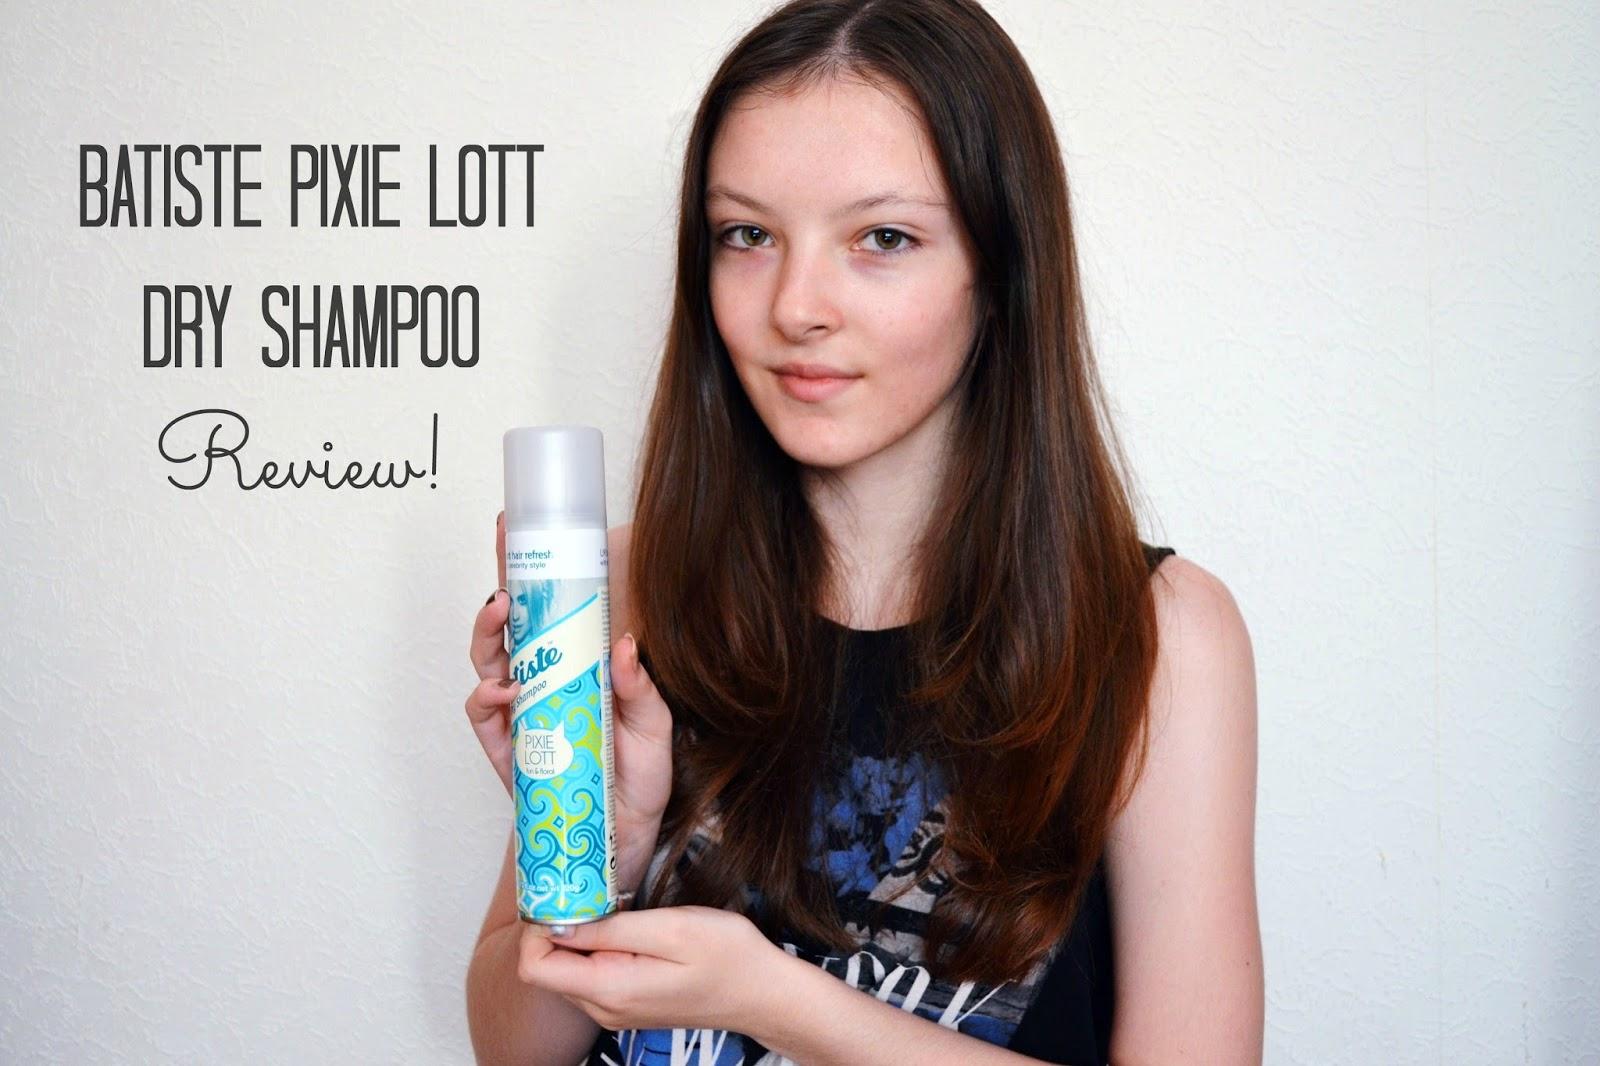 Batiste Pixie Lott Dry Shampoo Review